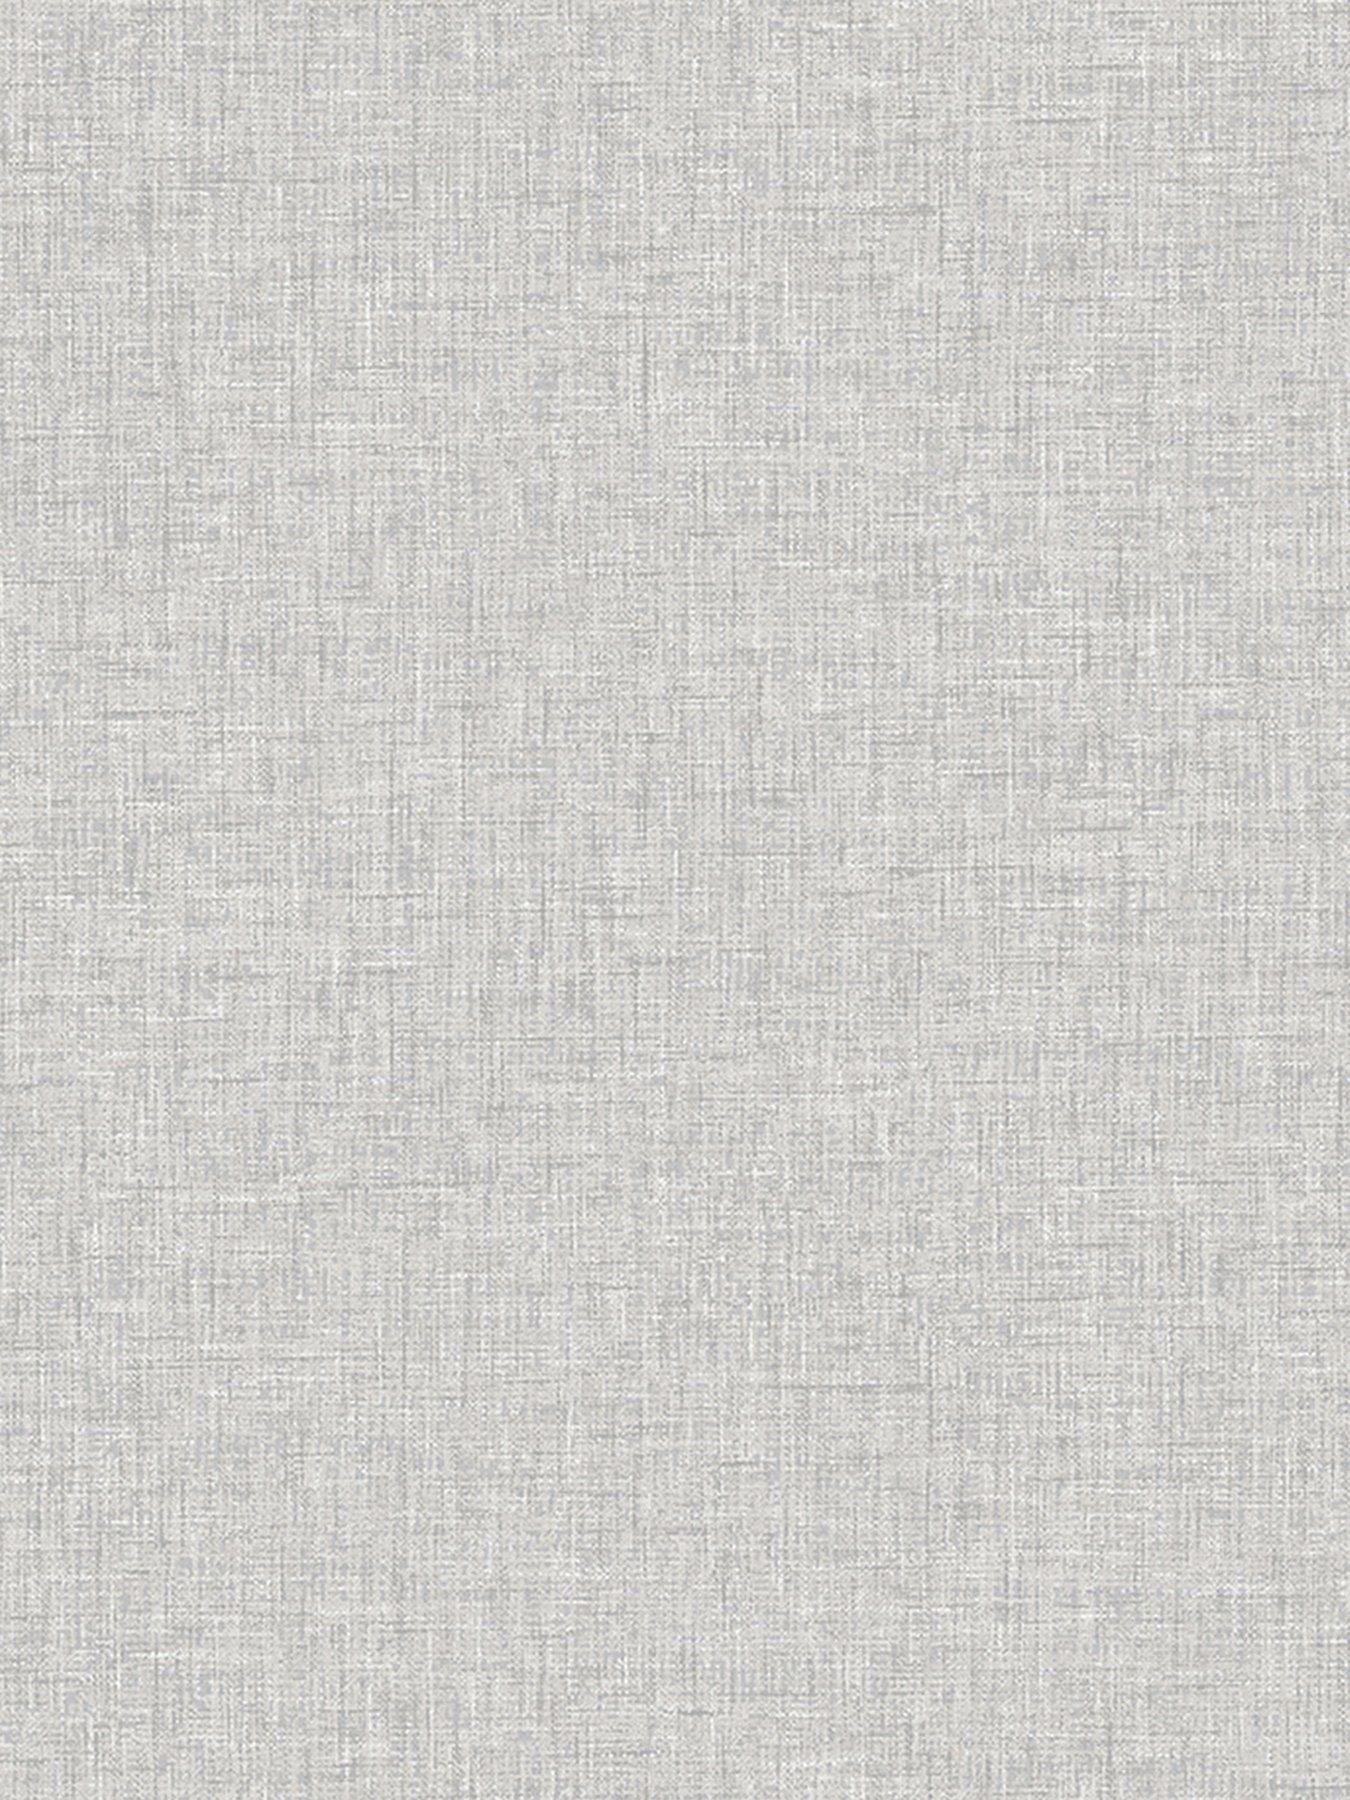 Linen Texture Wallpaper Grey Grey Linen Wallpaper Textured Wallpaper Linen Wallpaper